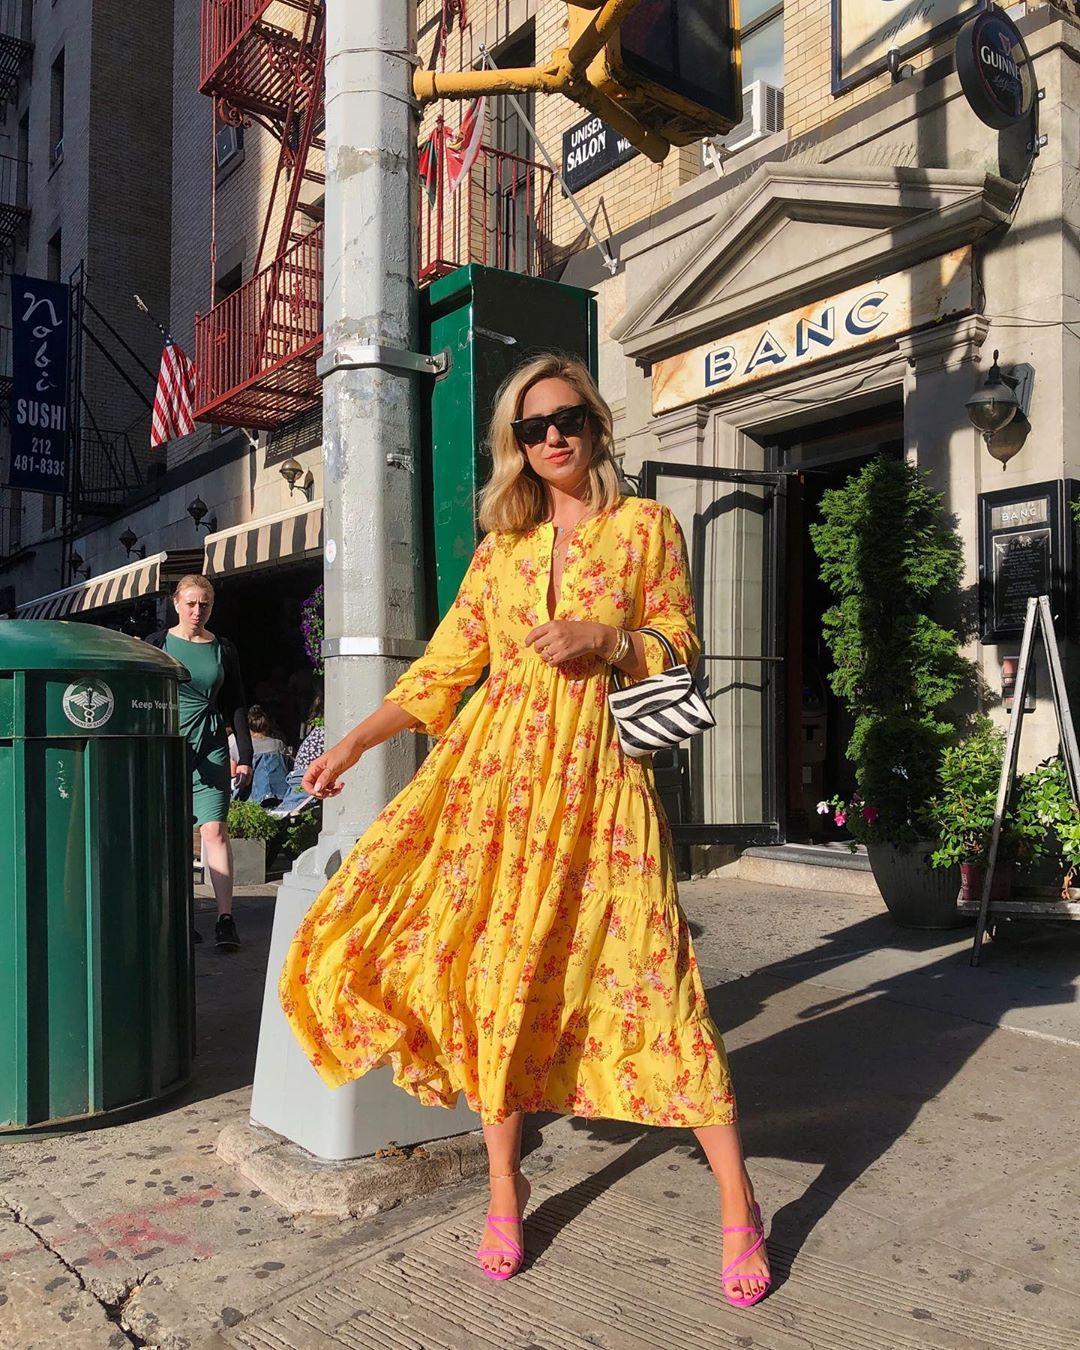 dress with floral print de Zara sur thefashionablybroke